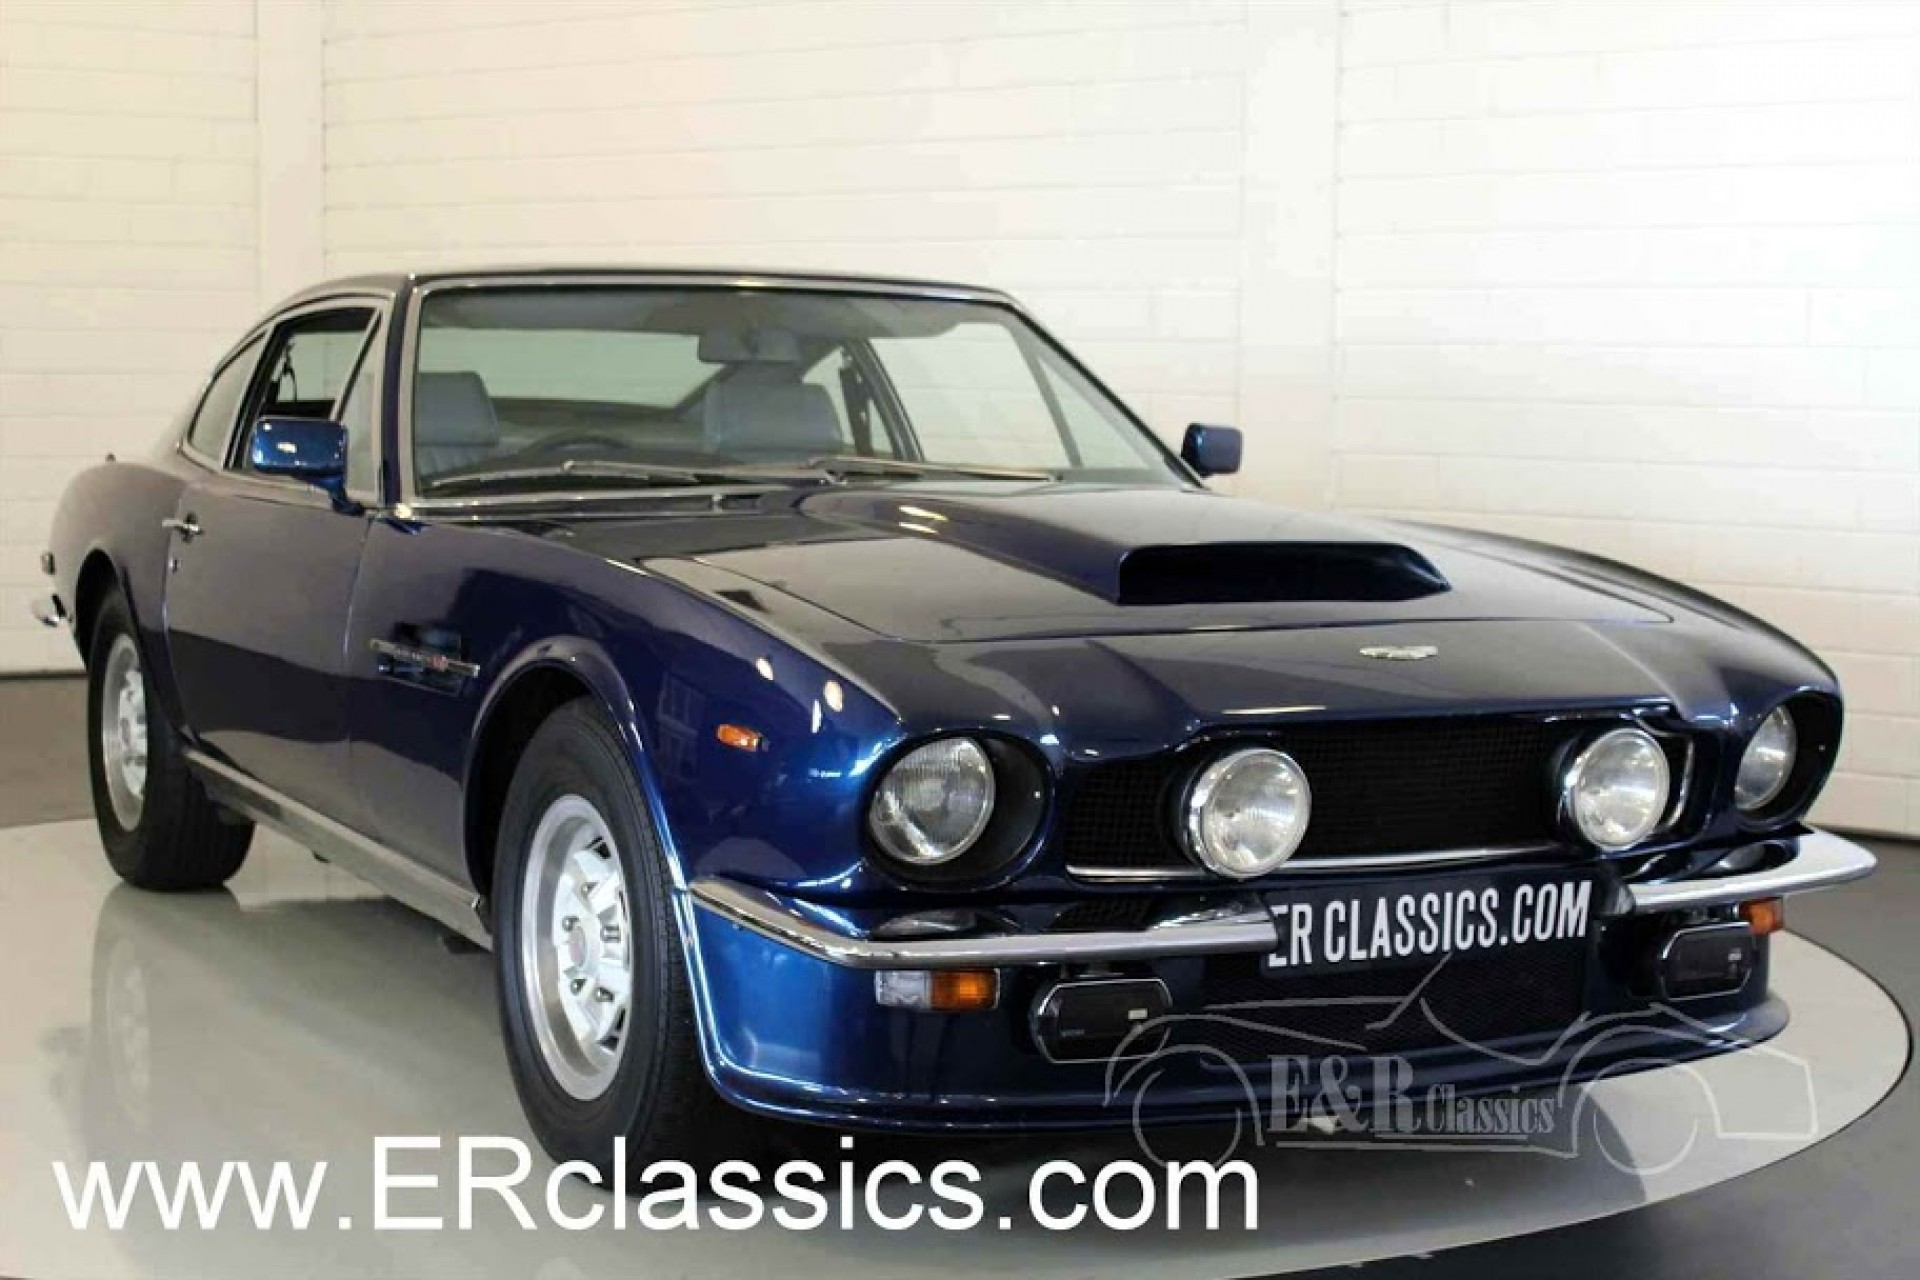 Aston Martin Classic Cars Aston Martin Oldtimers For Sale At E R Classic Cars